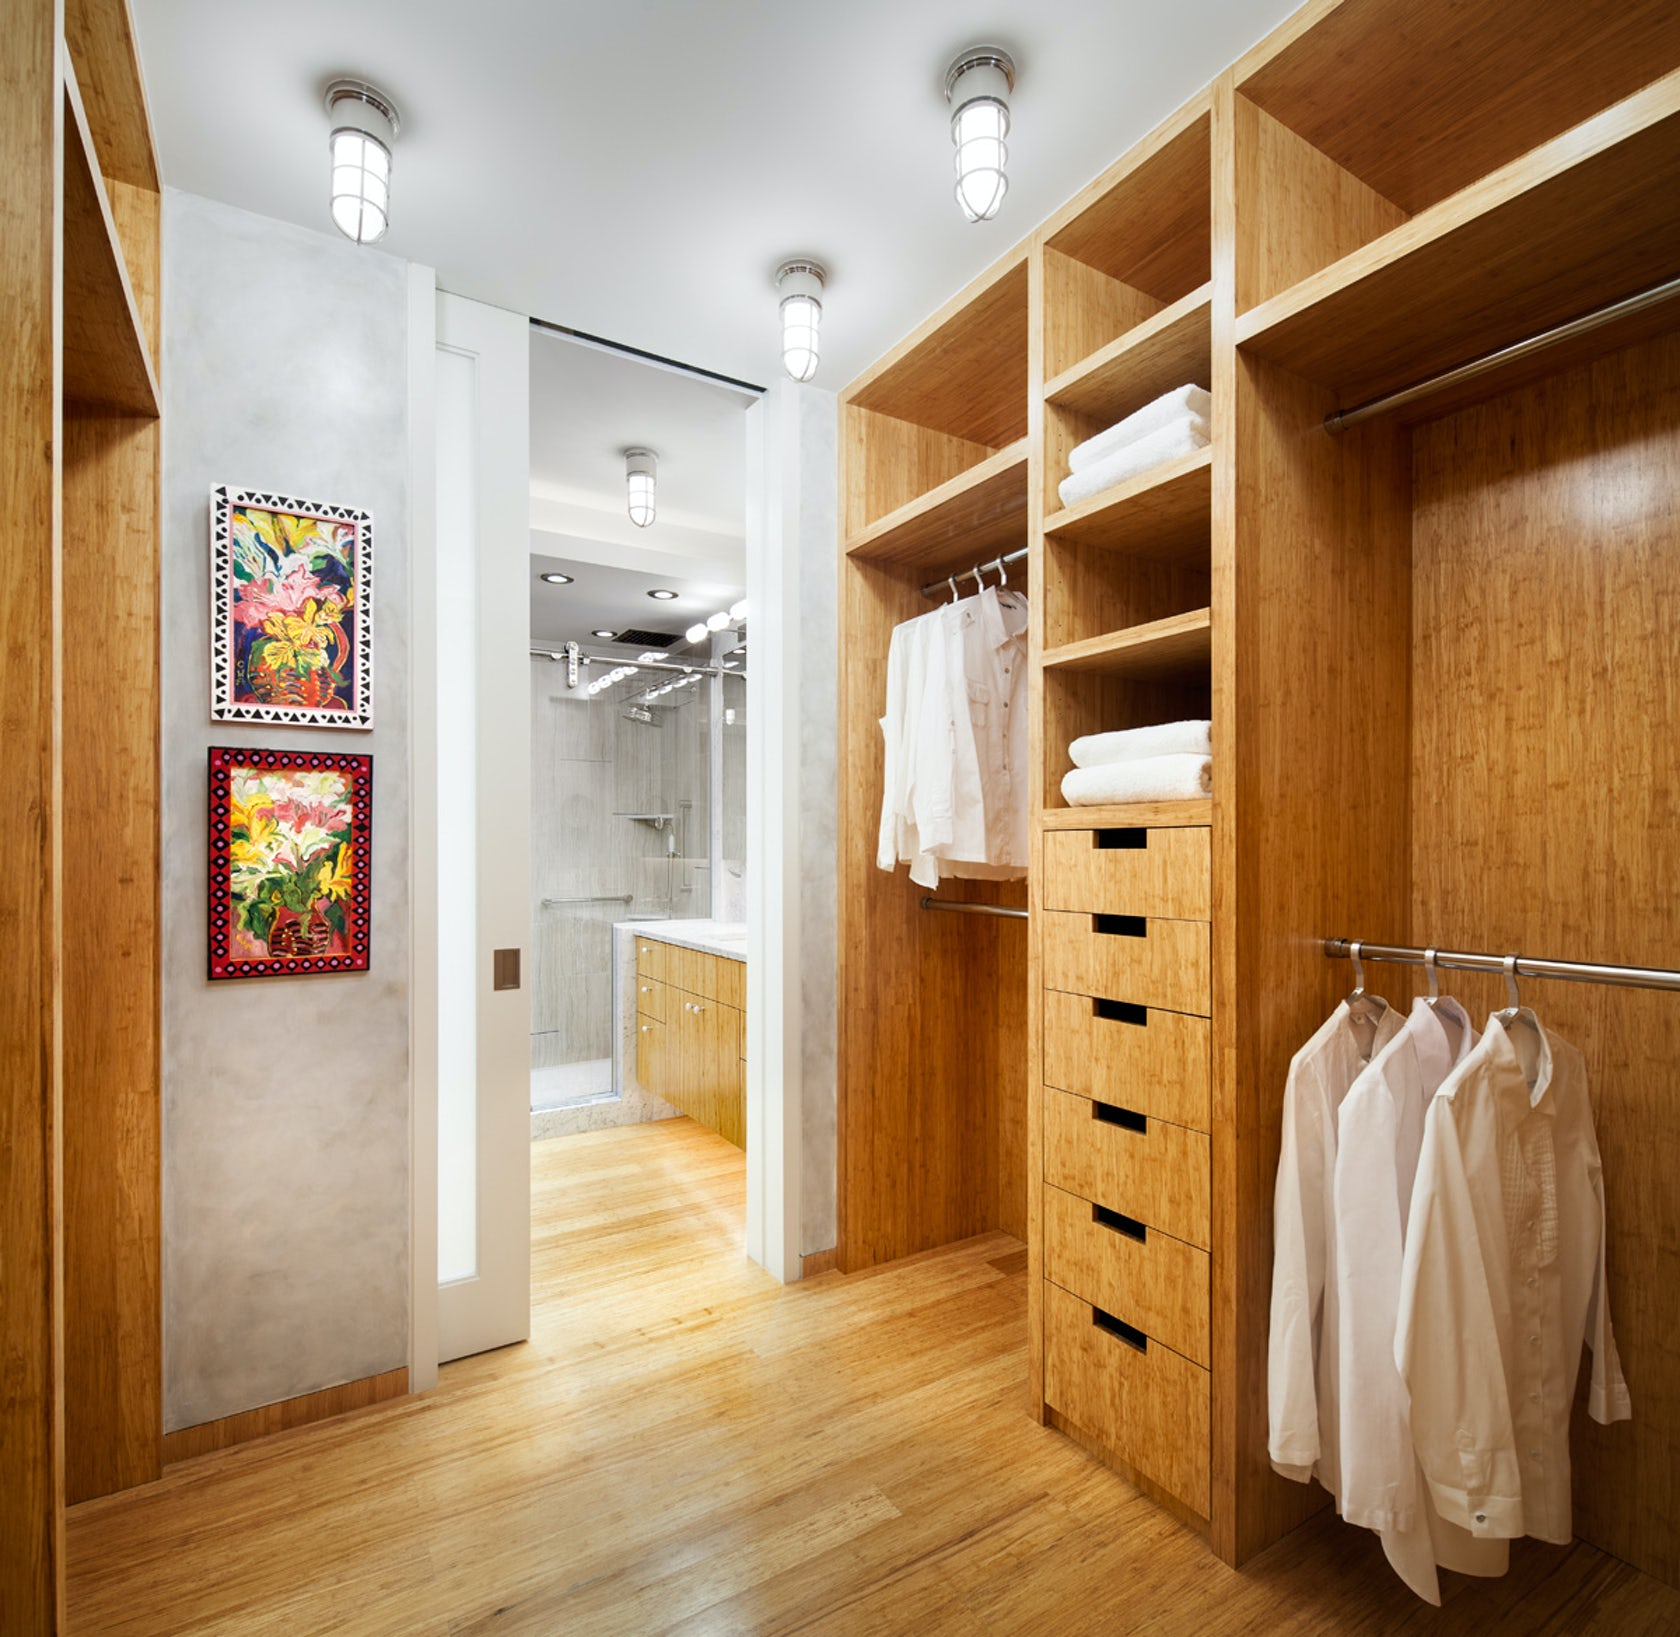 Connie's 170 Sf Accessible Master Bath/Dressing Room